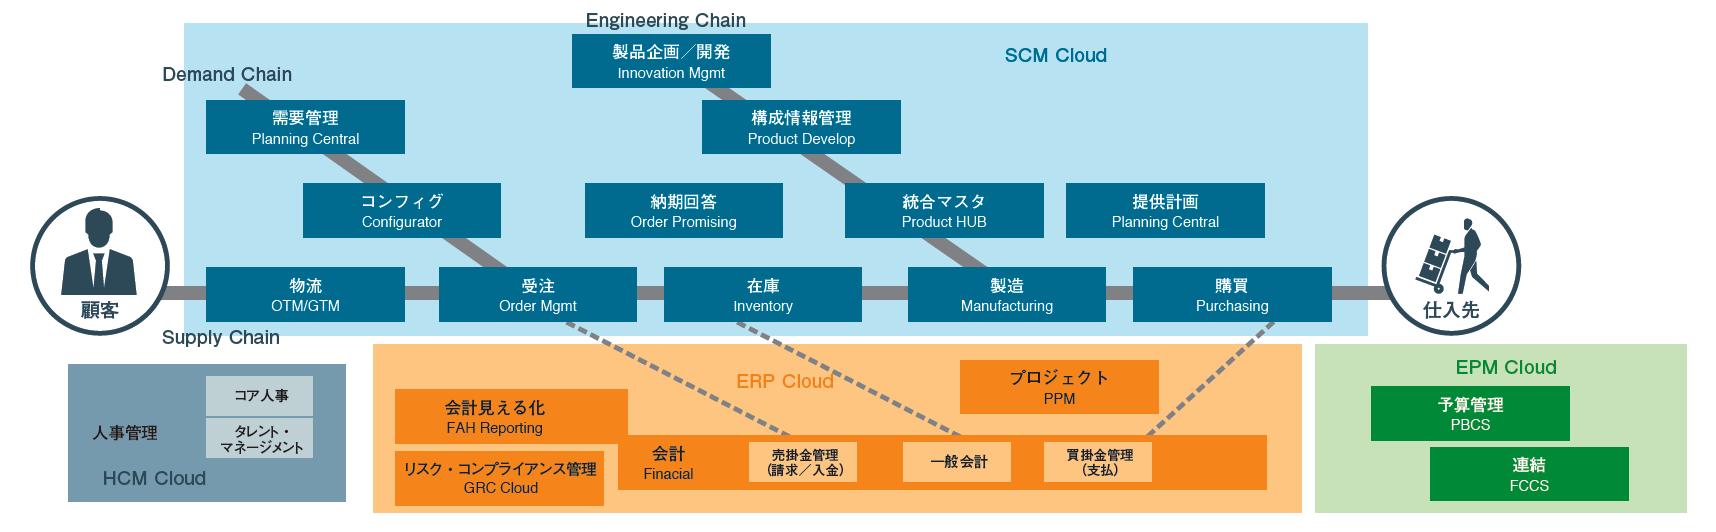 Oracle ERP Cloud 製品ラインナップ